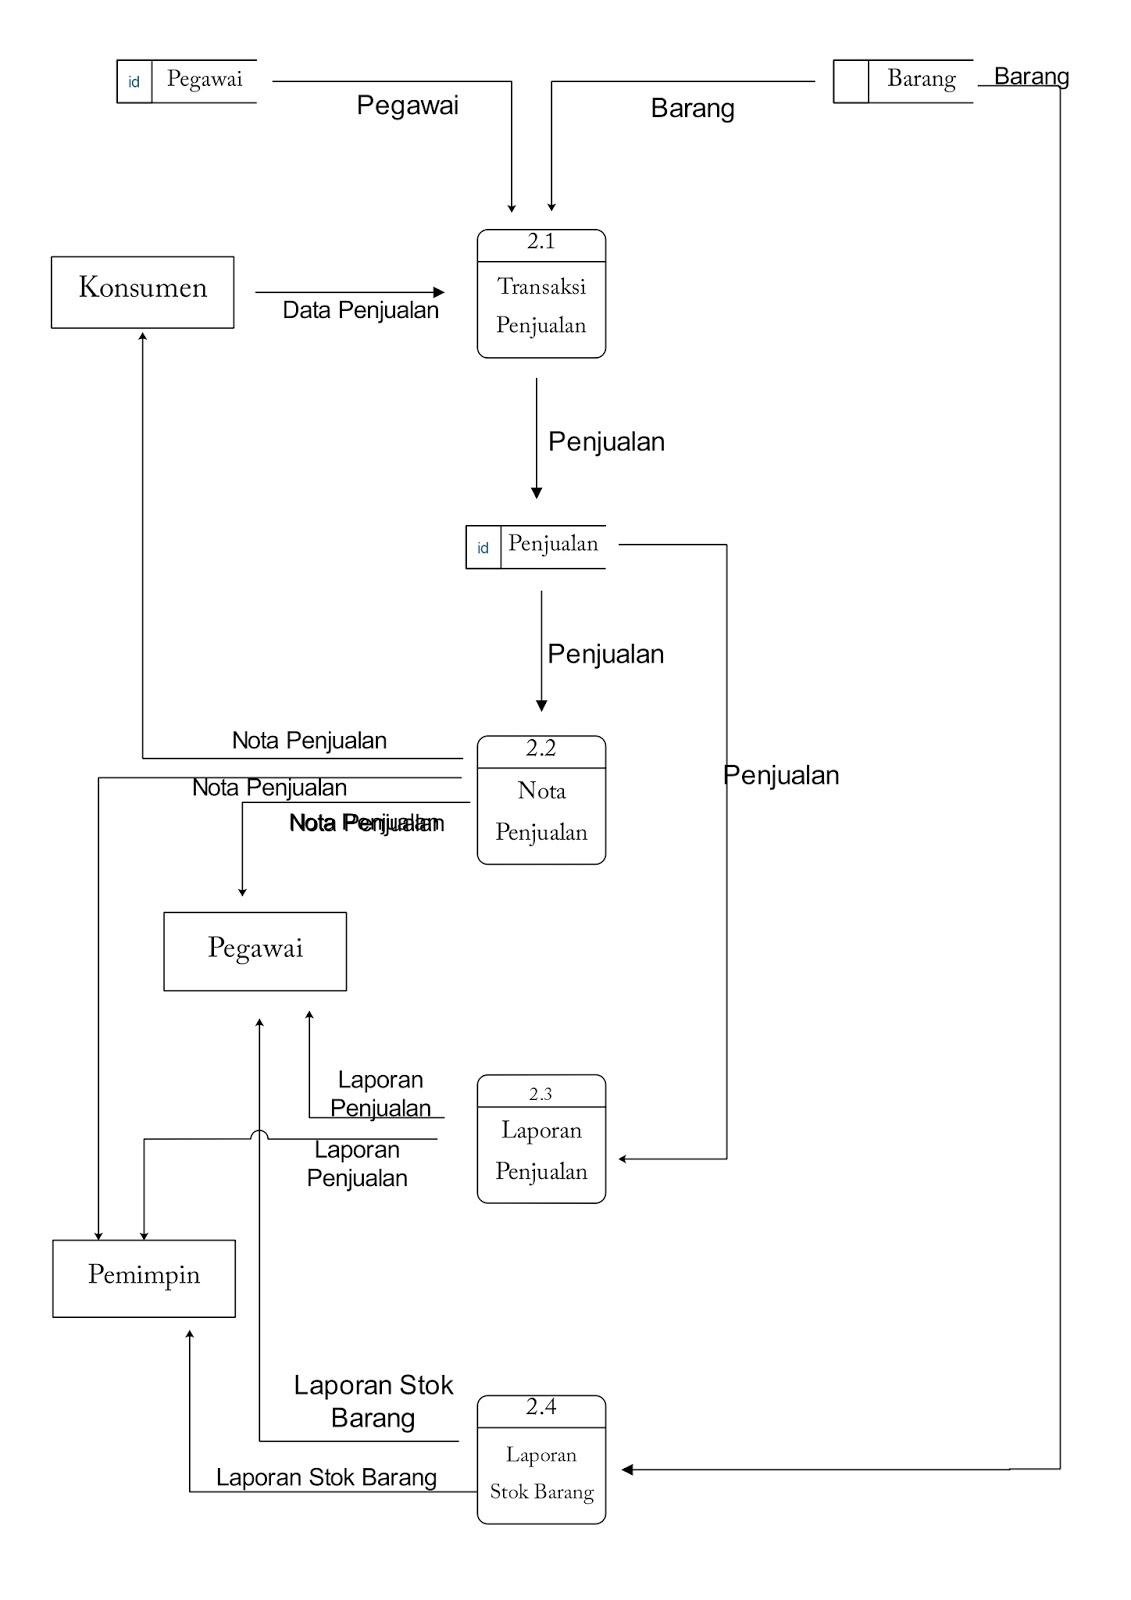 Diagram rinci penjualan complete wiring diagrams analisis data flow diagram rh fefaidah blogspot com ccuart Gallery